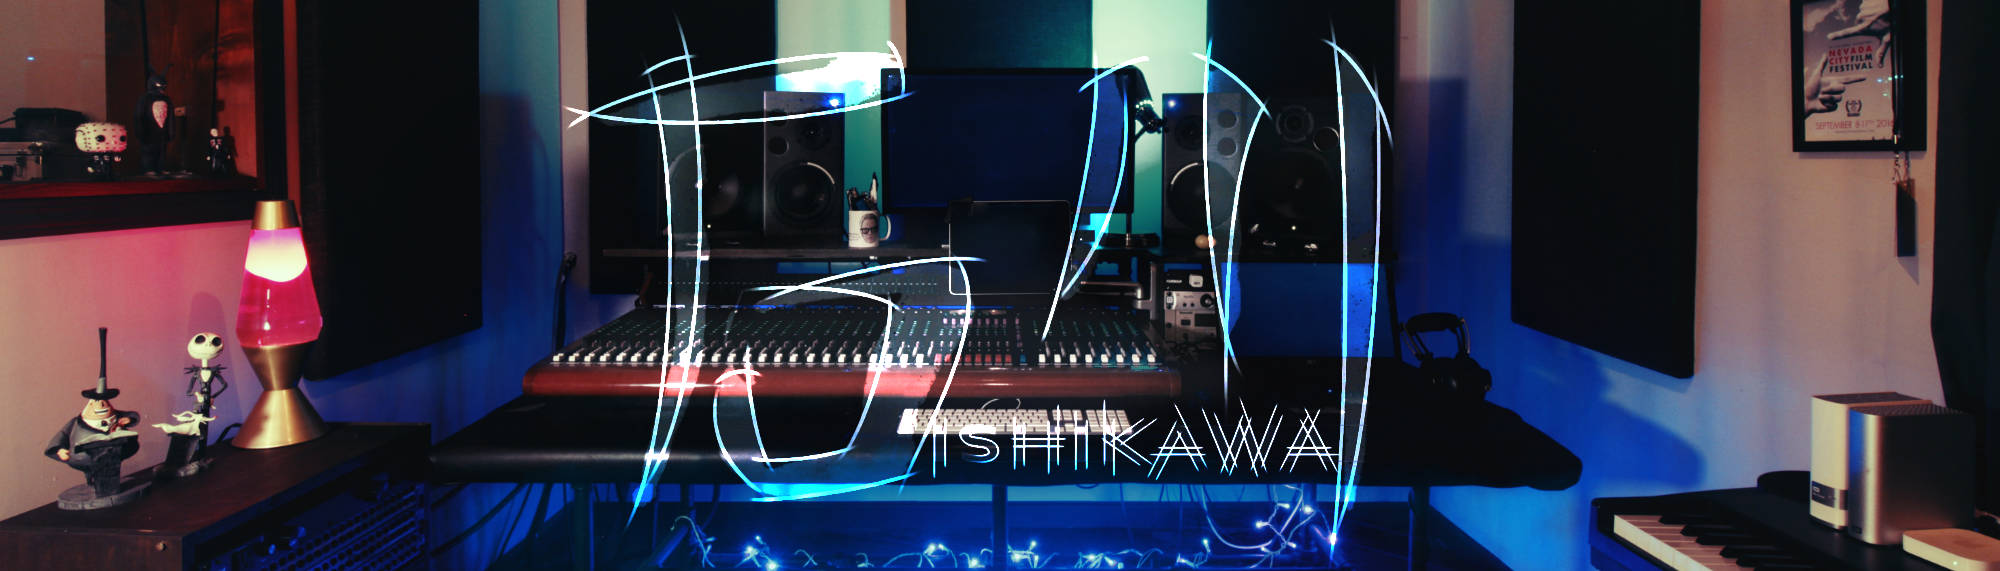 Ishikawa Media